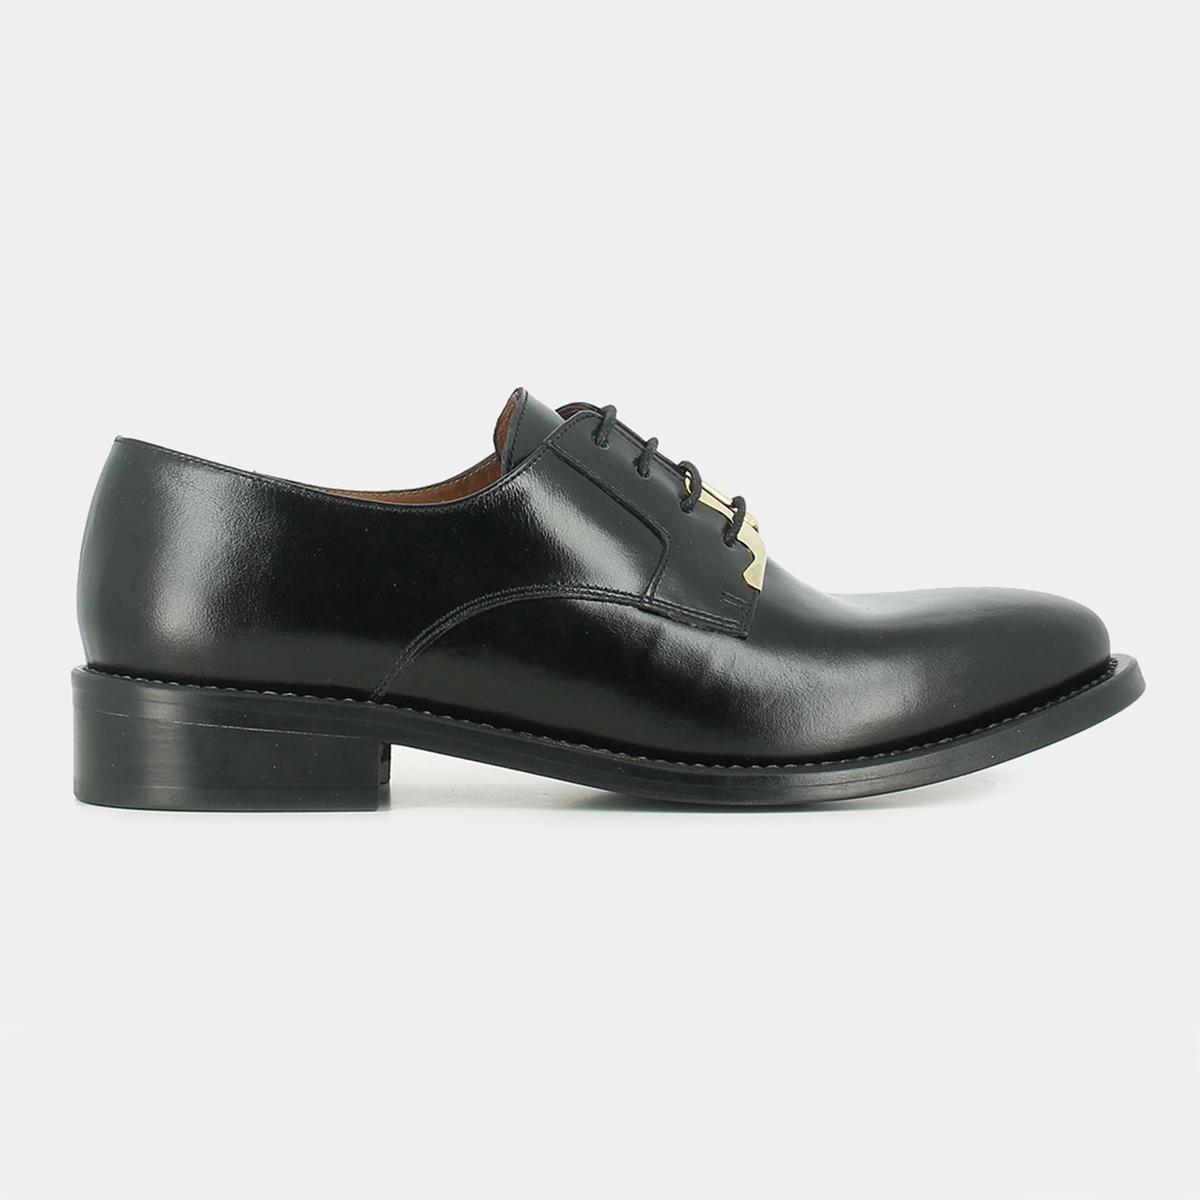 Ботинки-дерби из кожи Dagonet ботинки дерби из кожи dagonet